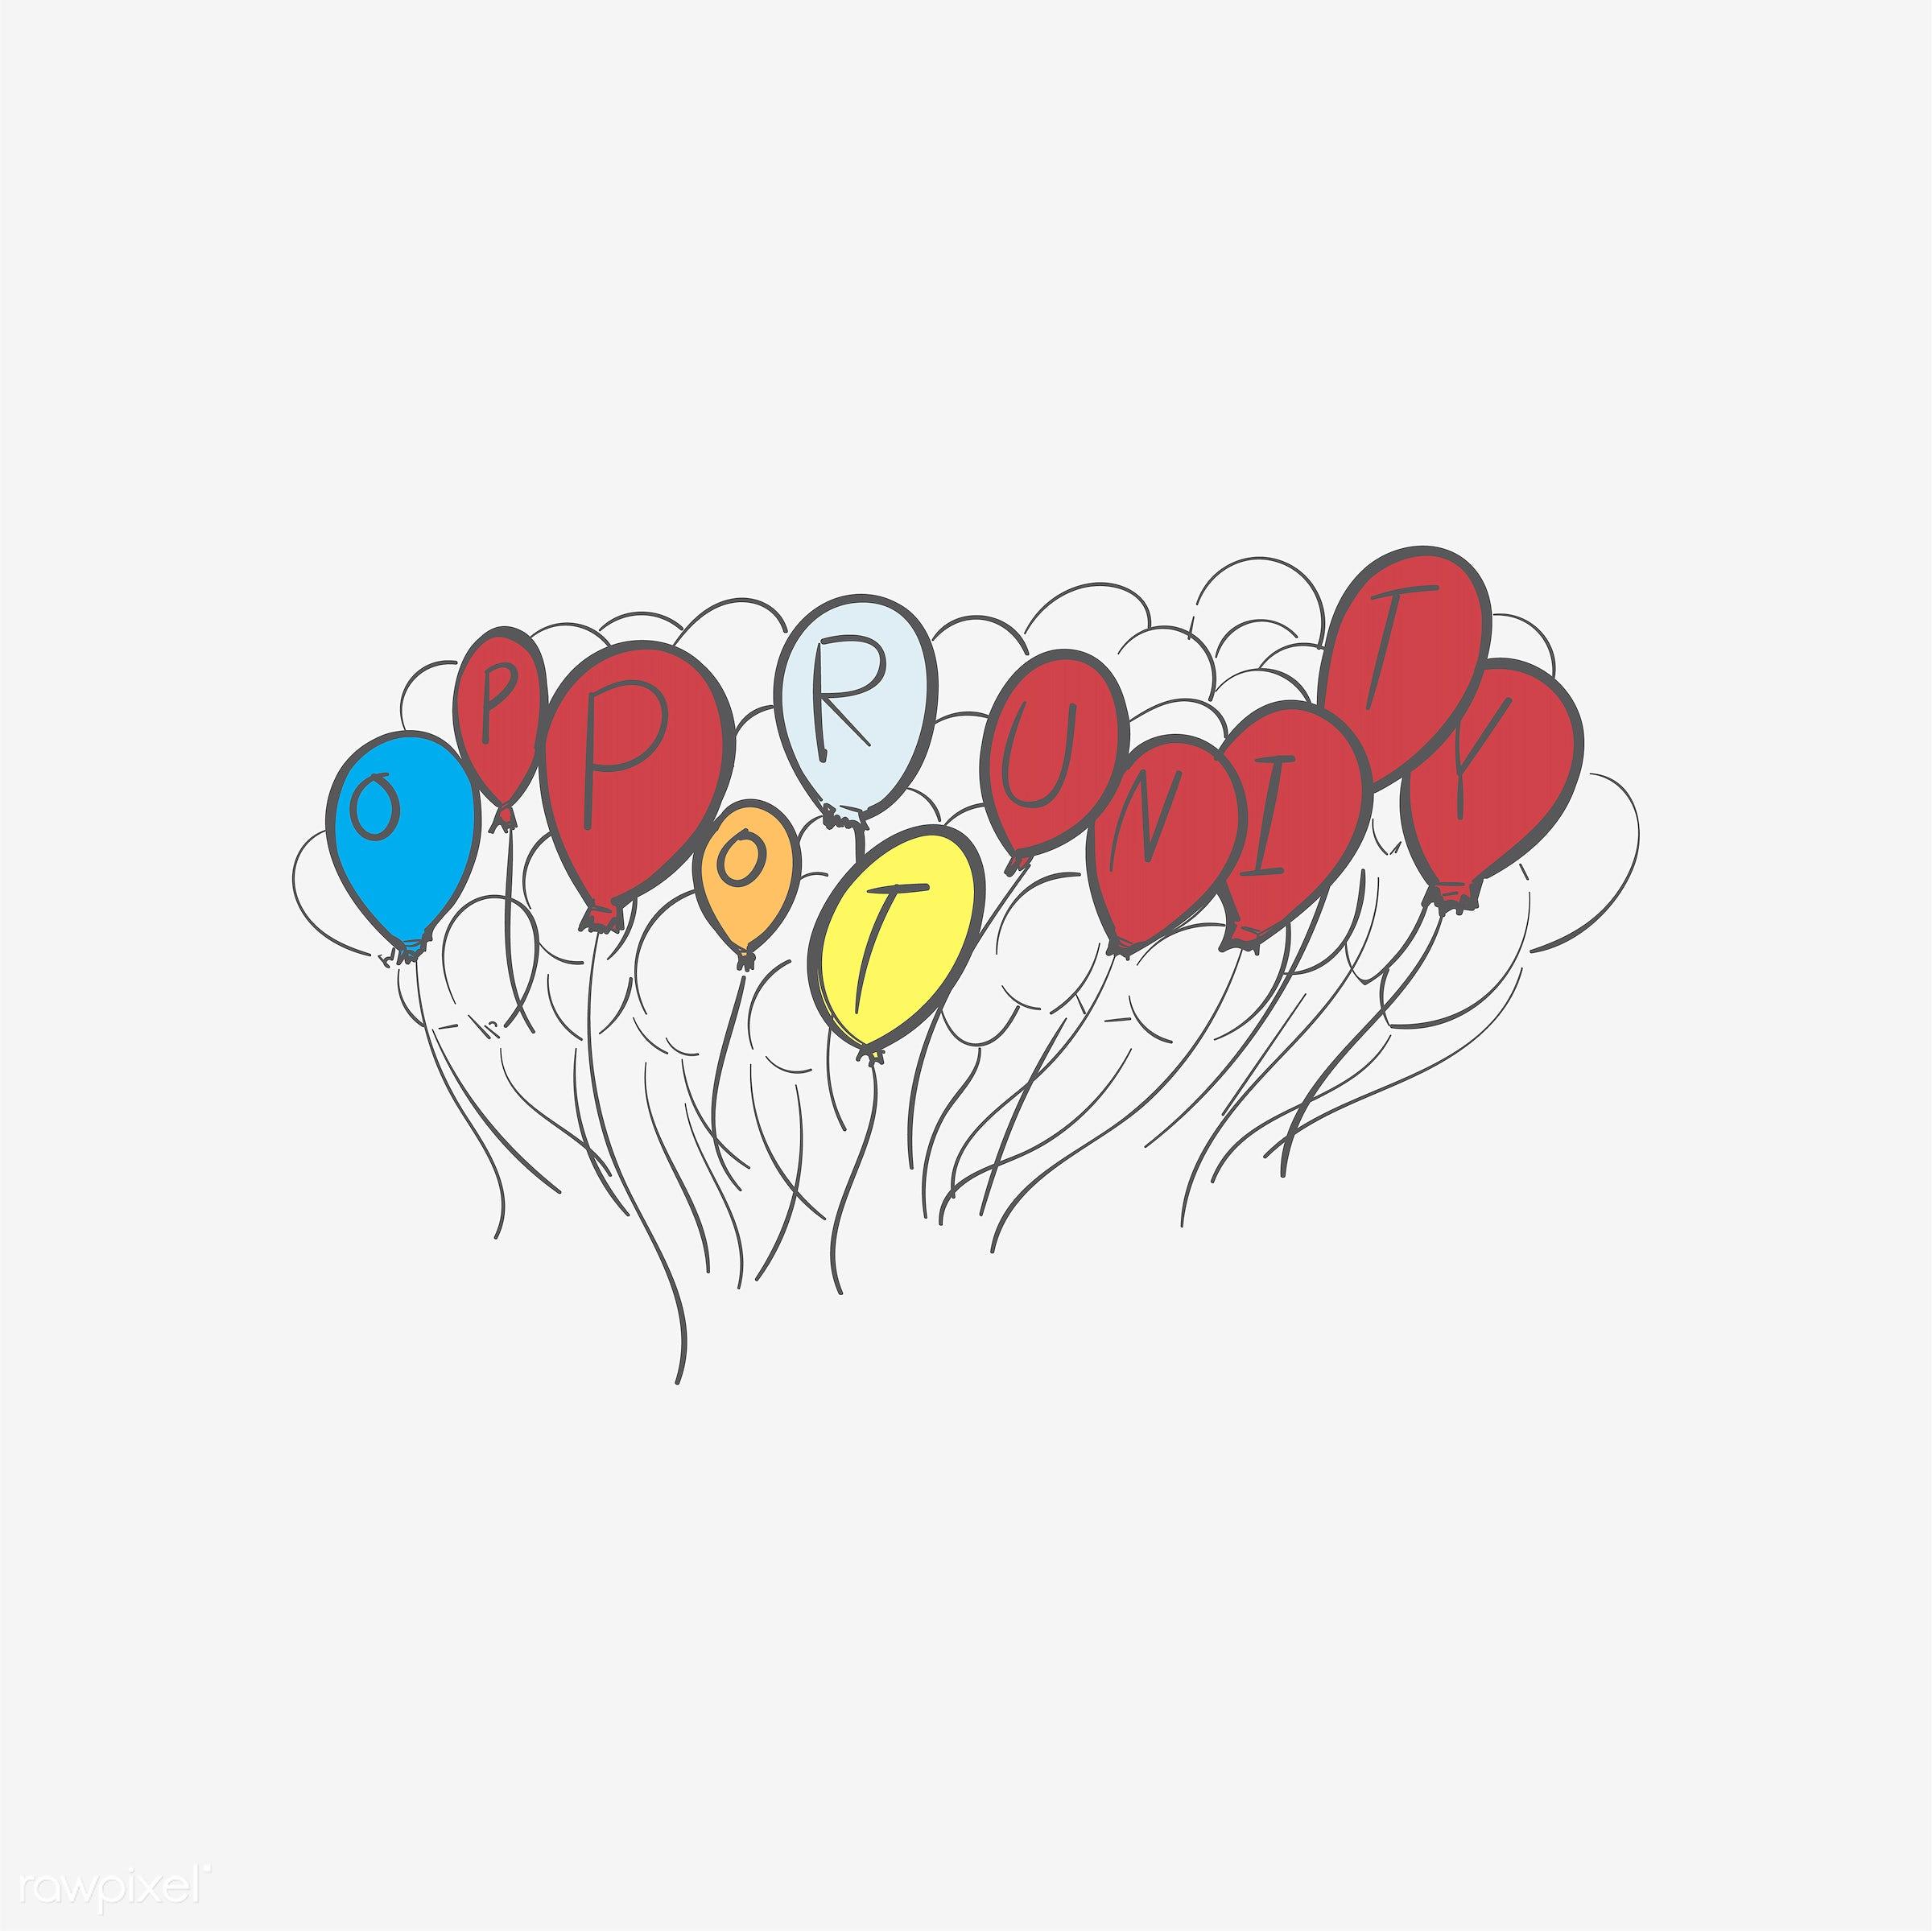 Hand drawing illustration of fail concept - art, artwork, balloons, creative, creativity, design, draw, drawing, drawn, fail...